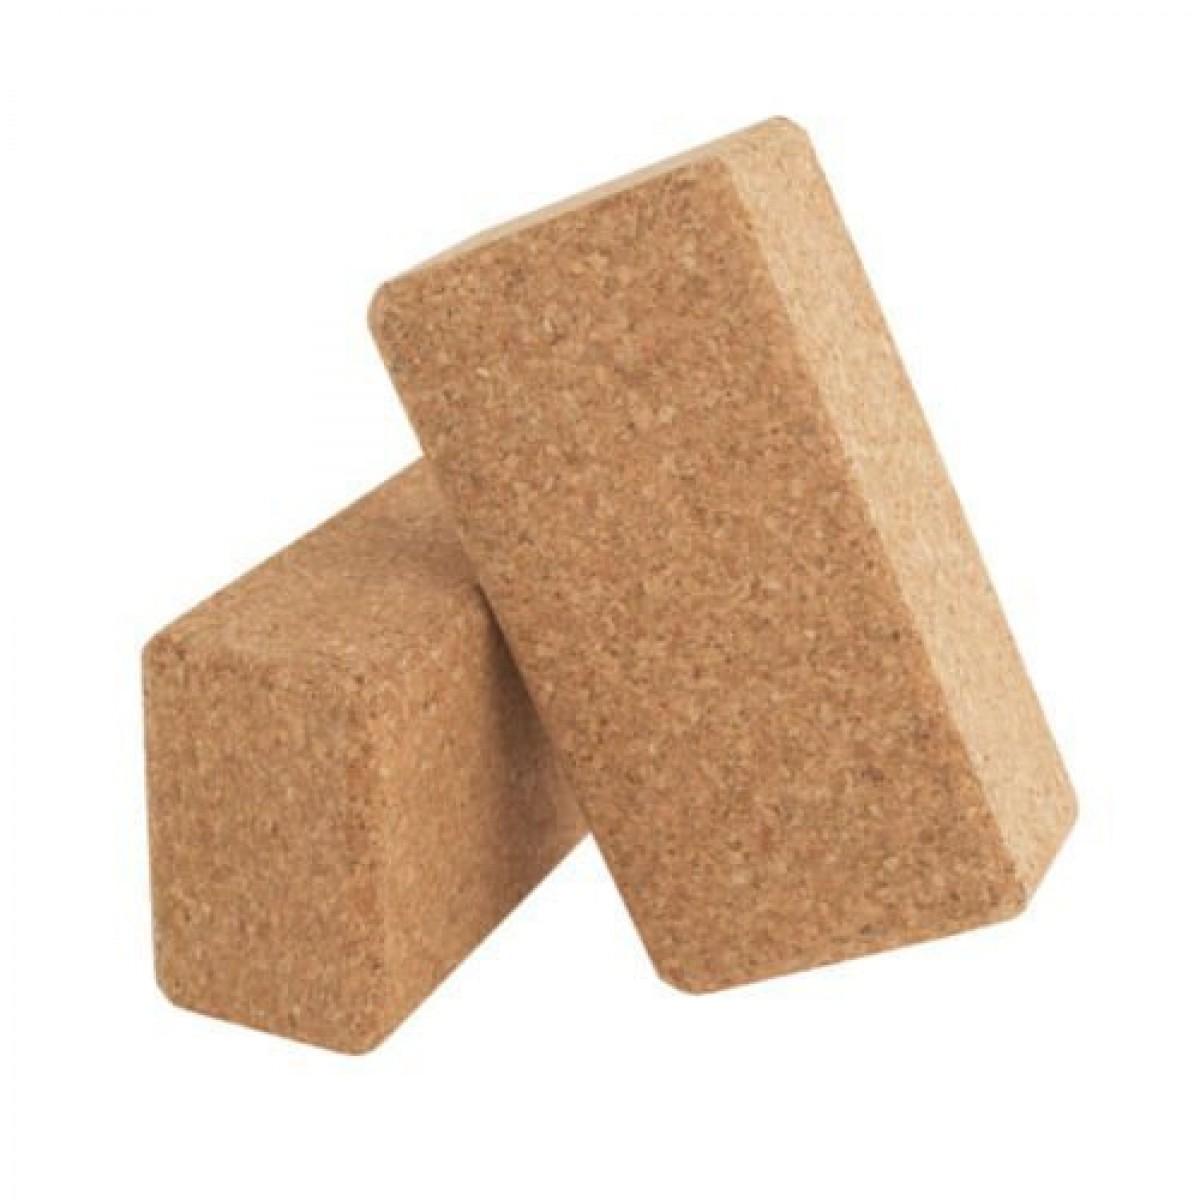 Symiyoga Natural Cork Yoga Blocks Symi Yoga